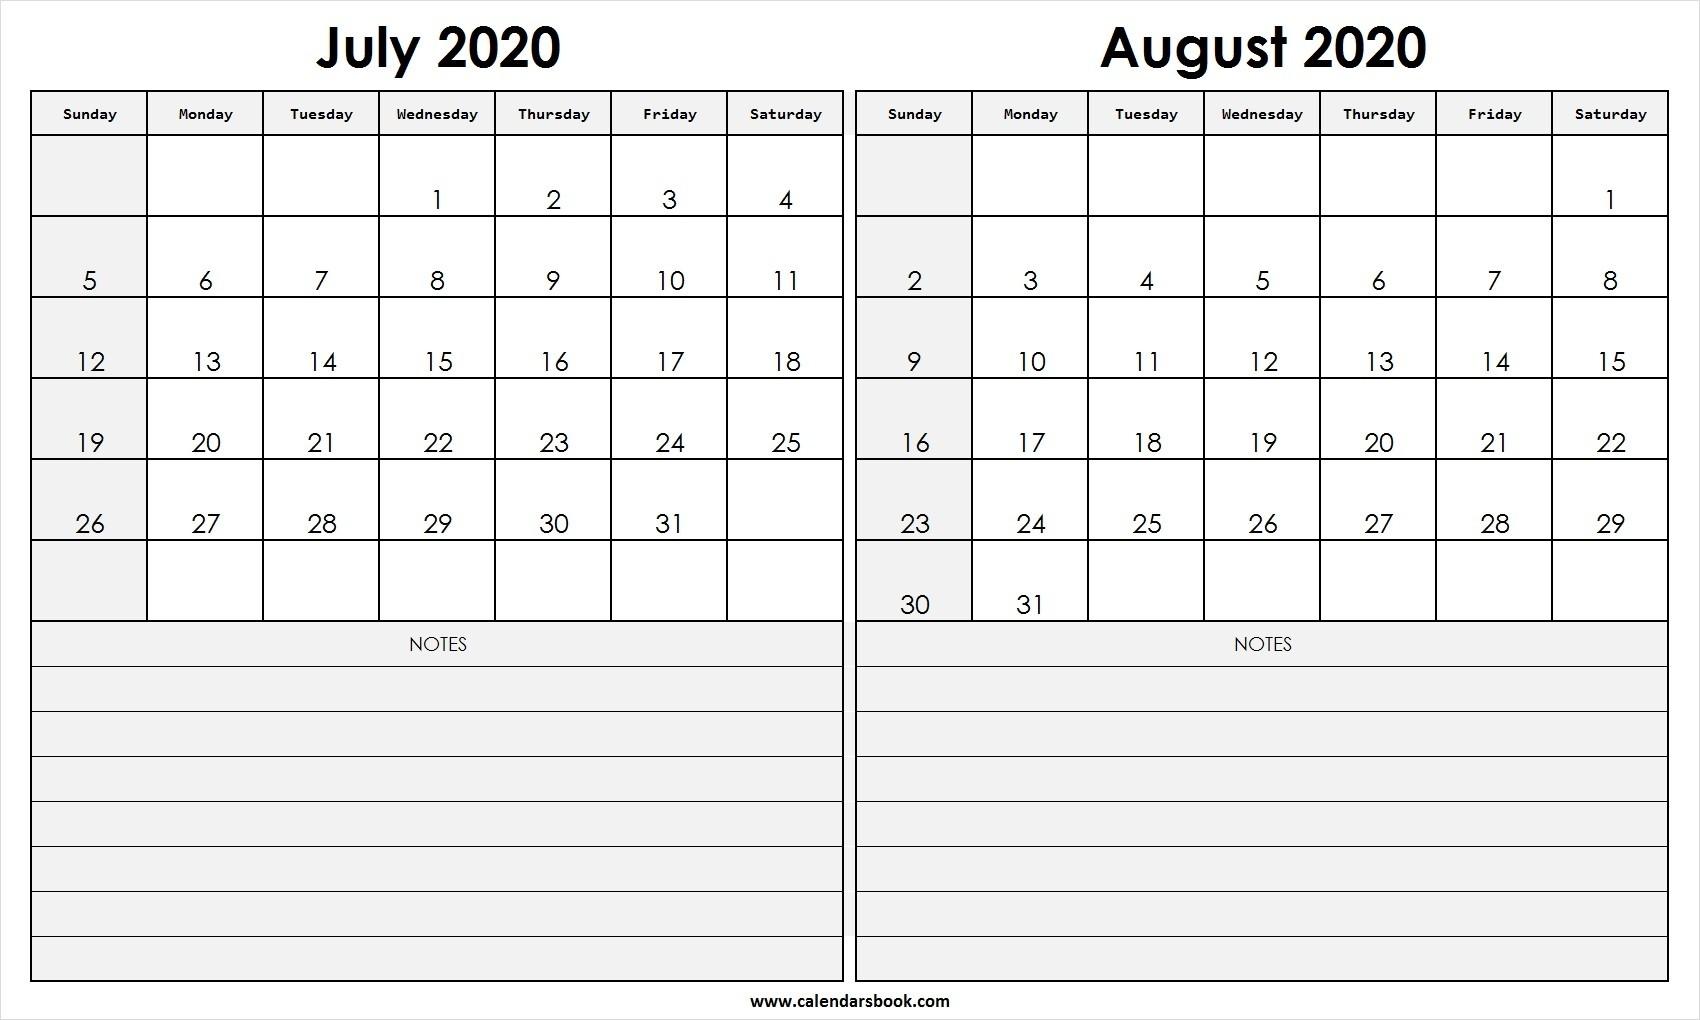 Print July August 2020 Calendar Template | 2 Month Calendar-Printable Monthly Calendar July August 2020